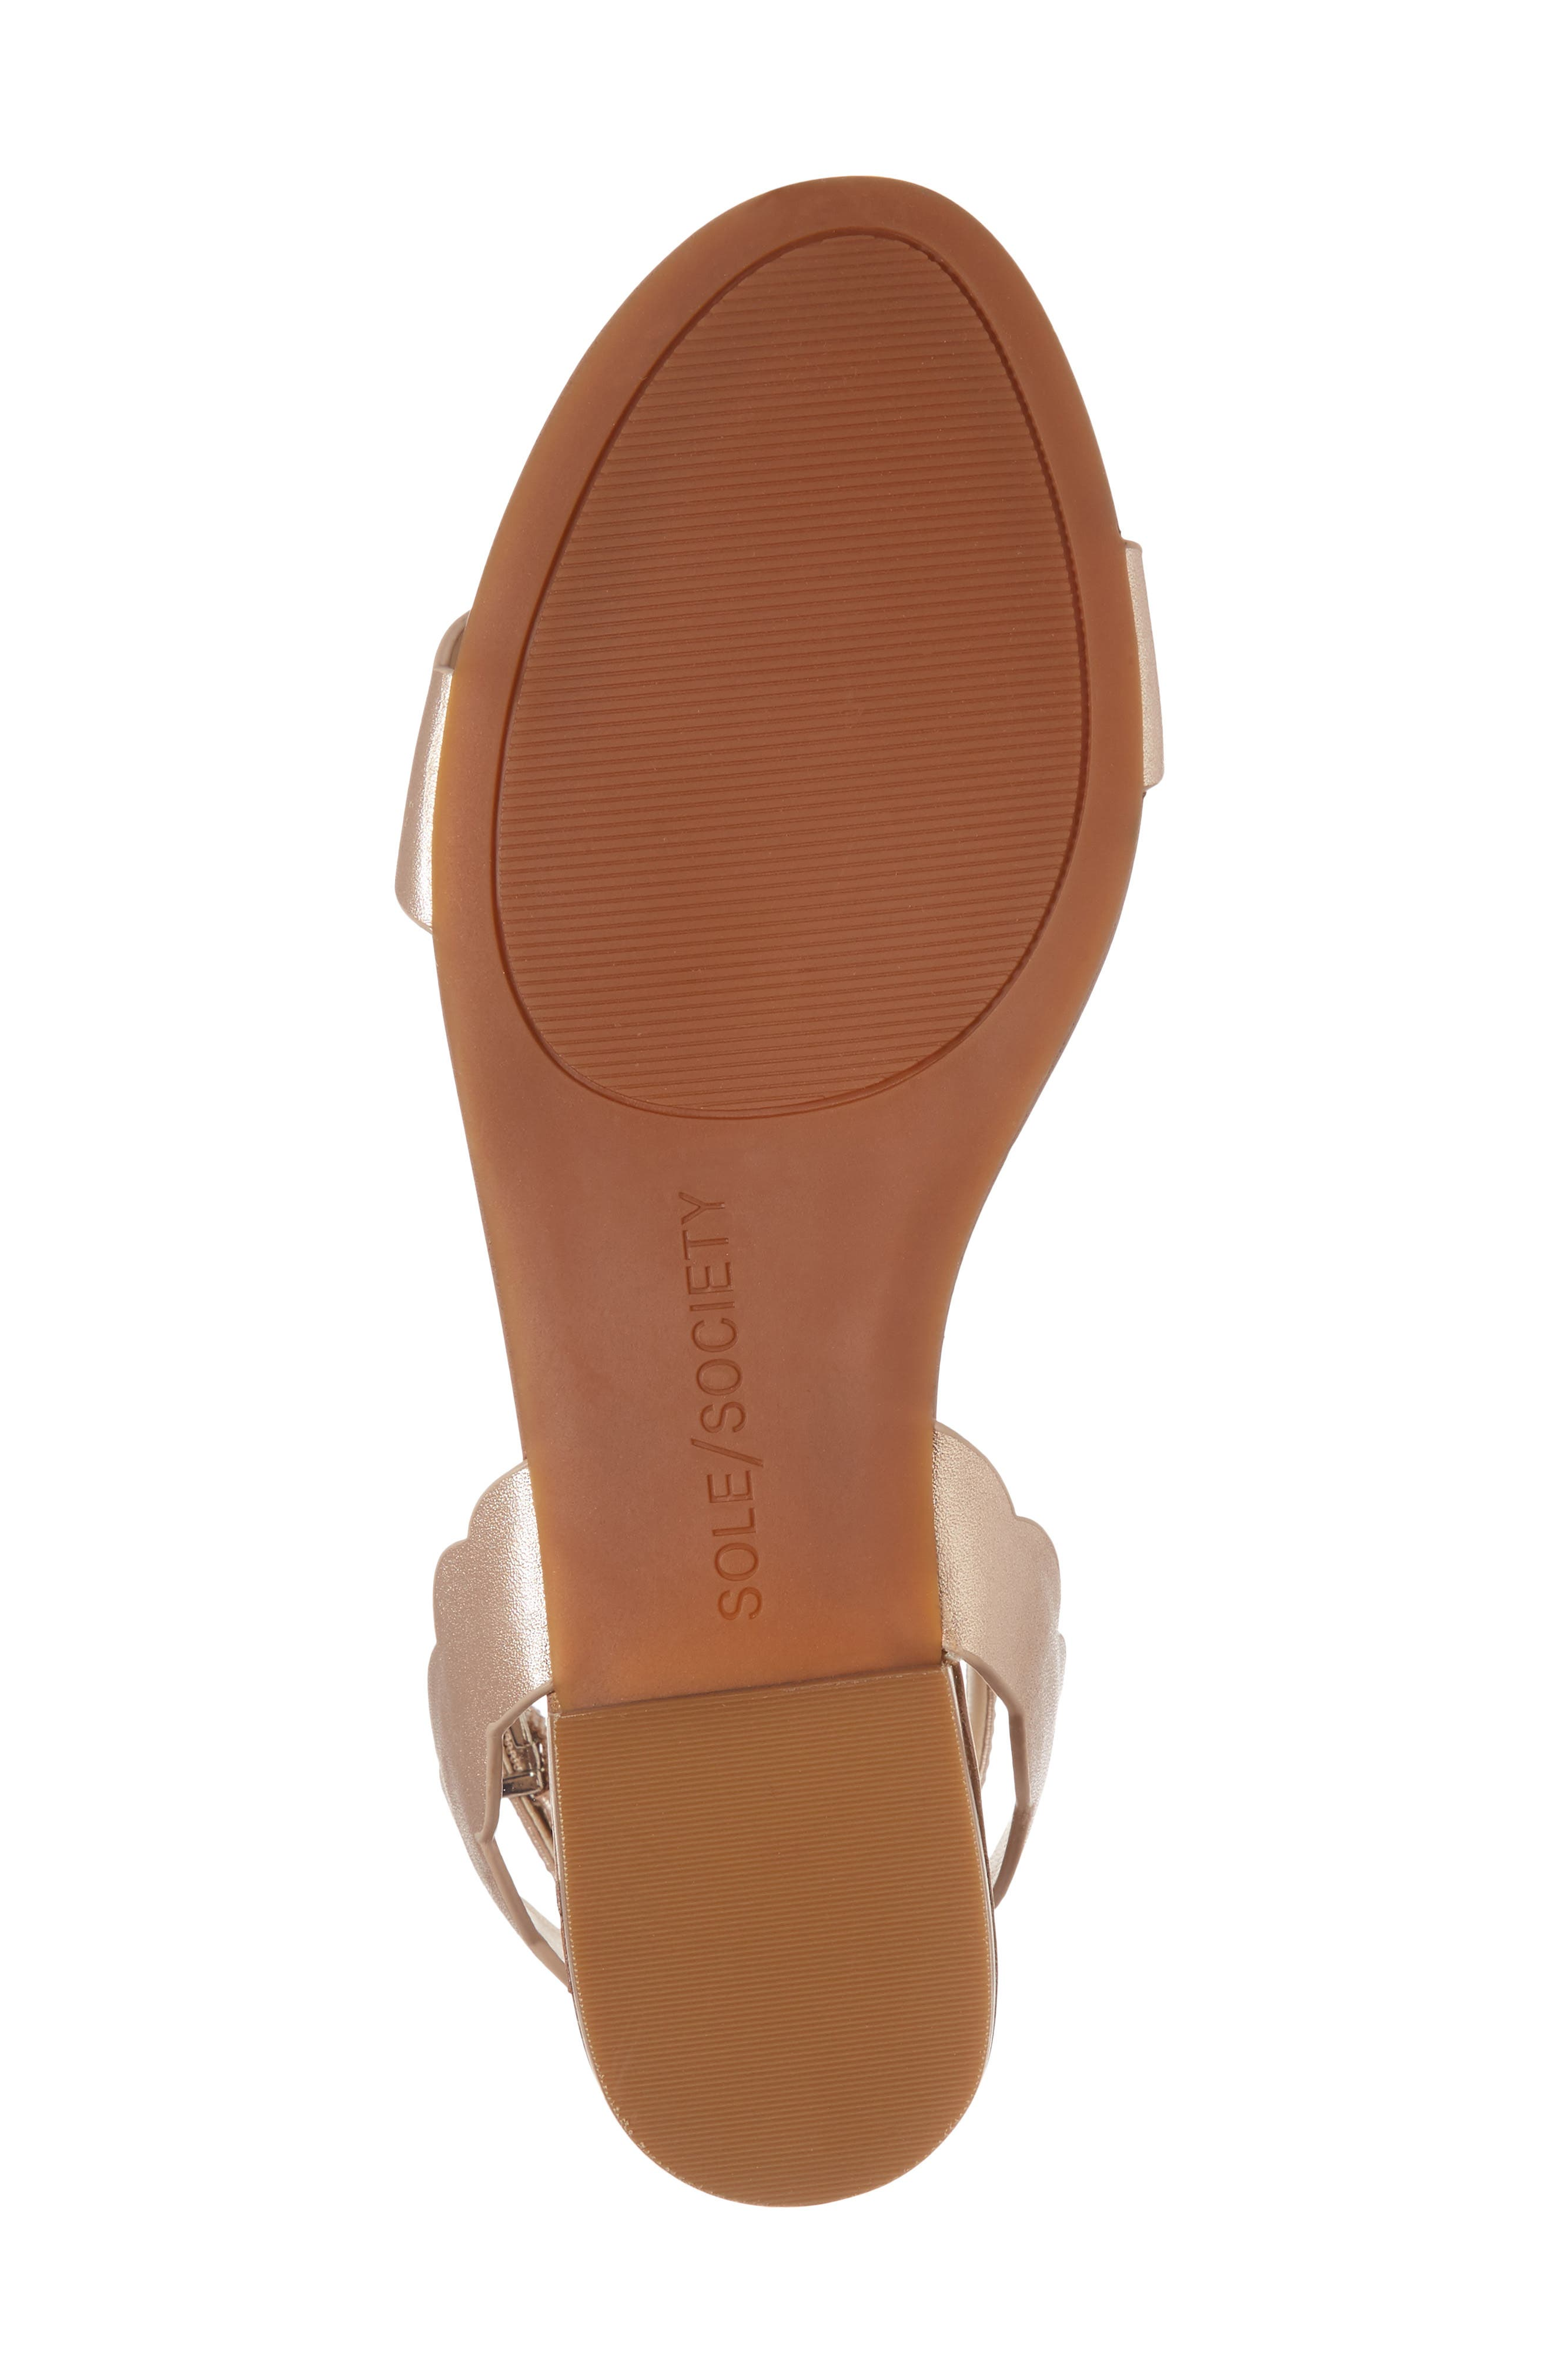 'Odette' Scalloped Ankle Strap Flat Sandal,                             Alternate thumbnail 32, color,